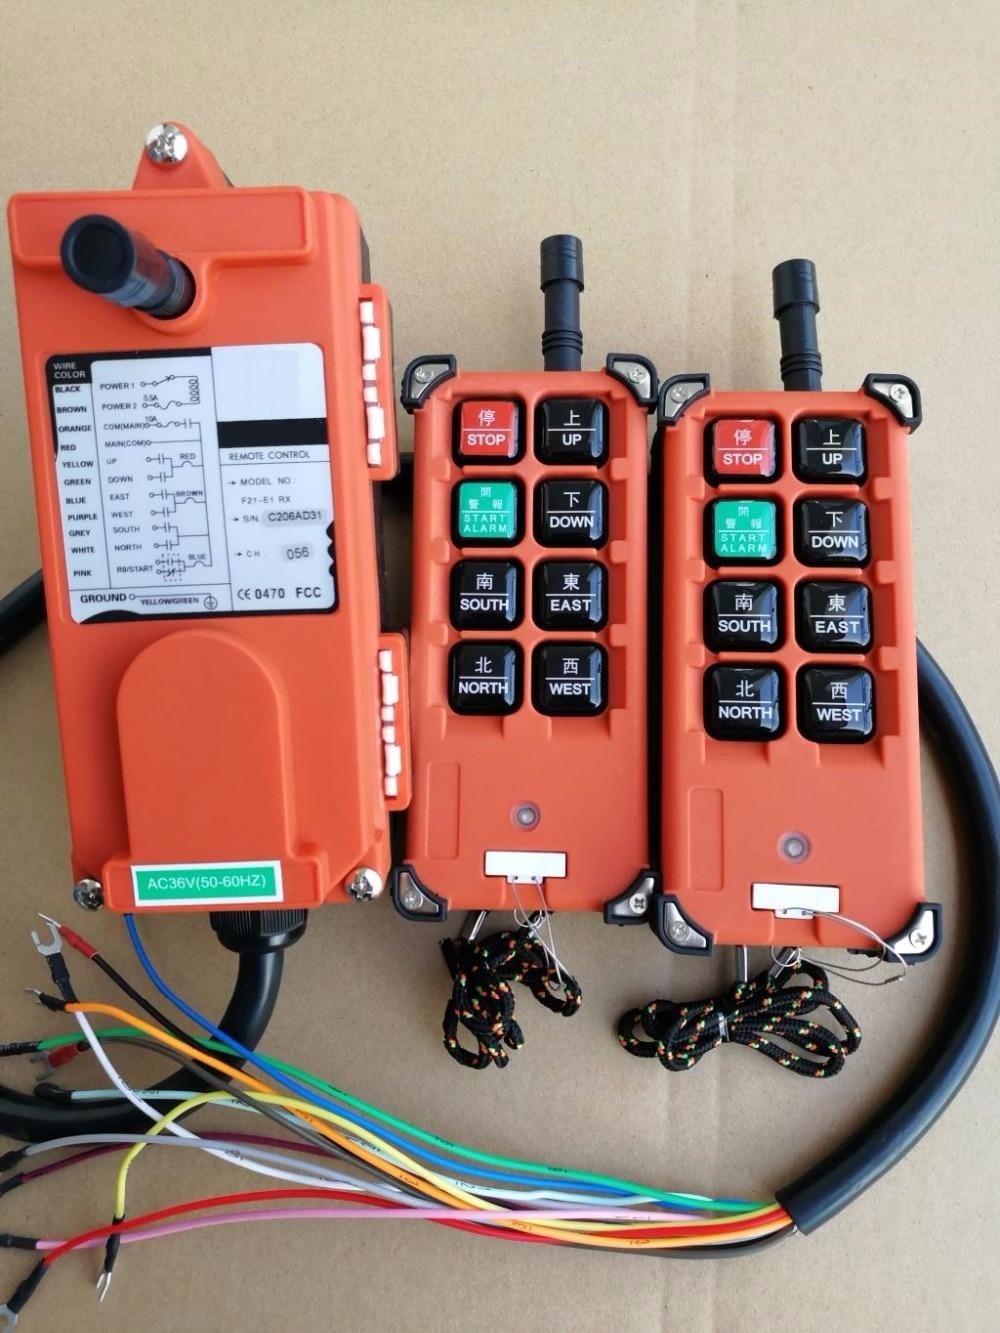 Free Shipping F21-E1B 36V 2PC transmitter 1PC receiver Motor control button Hoist crane remote control wireless radio Uting цена